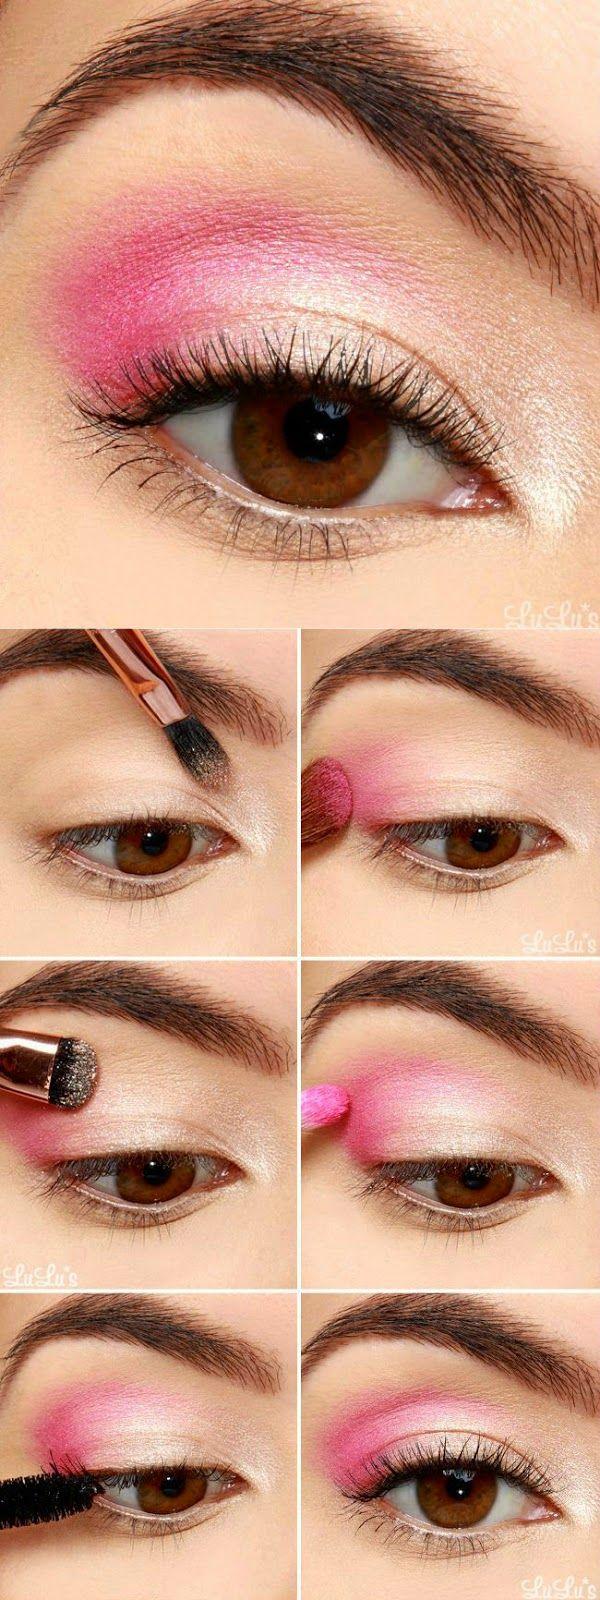 Pretty Pink Eyeshadow Tutorial Step by Step | Blog LuLu*s